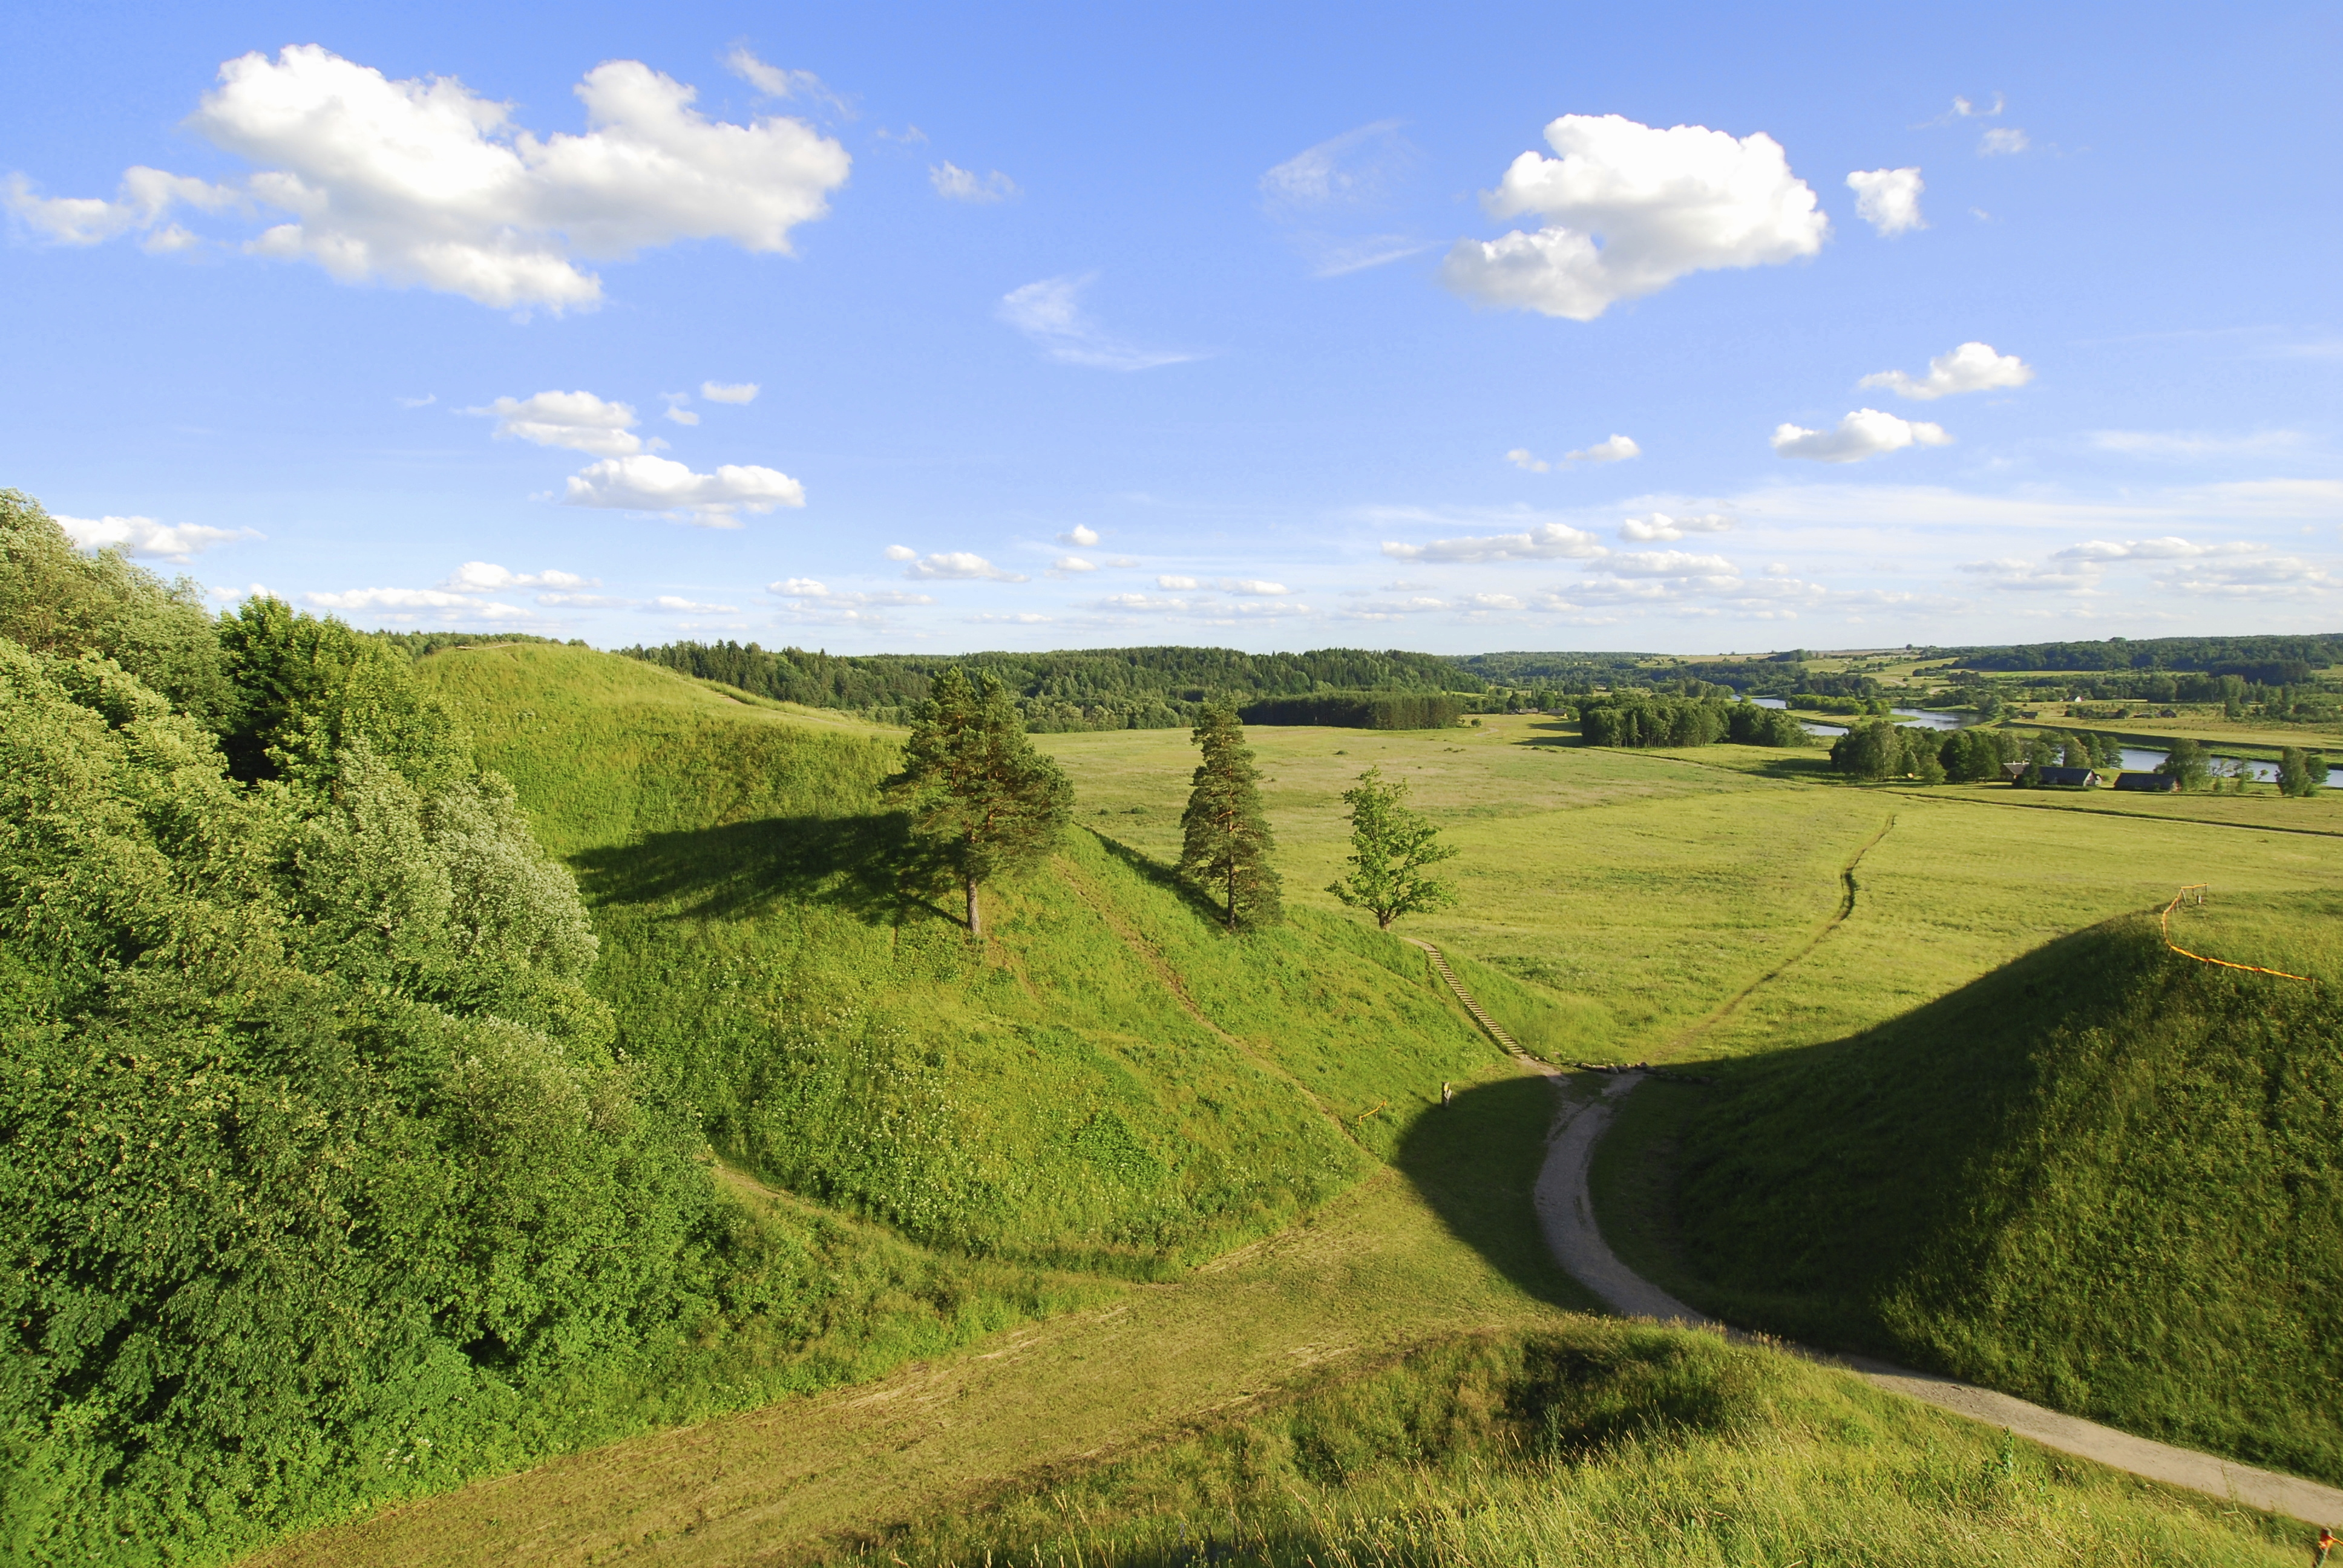 Kernave's strange mounds, Lithuania